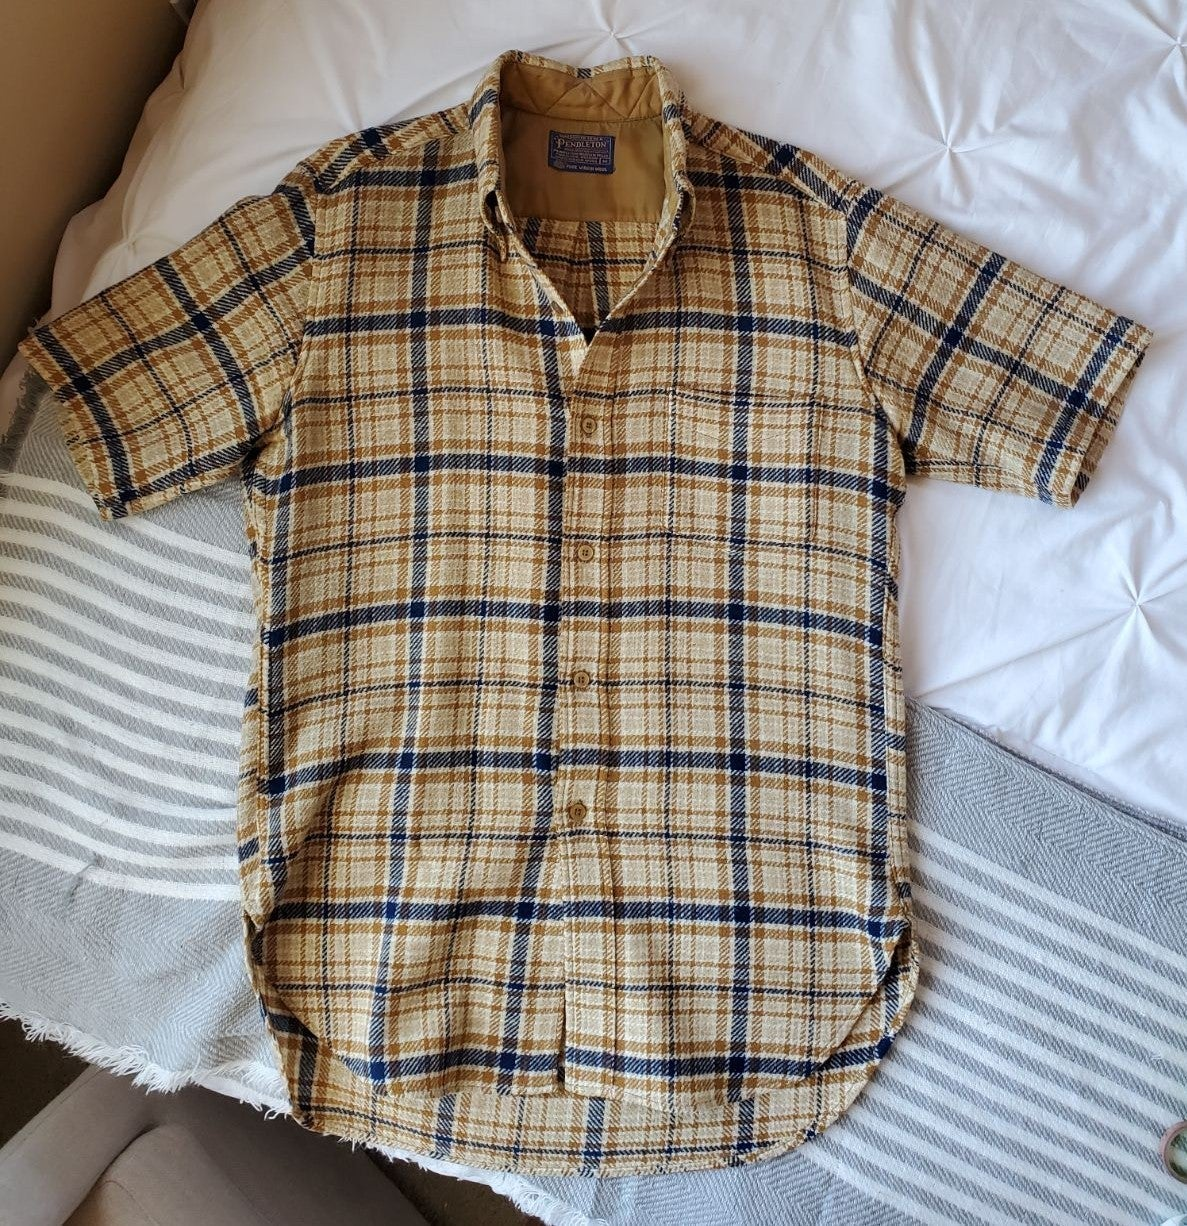 1970s Vintage Pendleton Plaid Wool Shirt